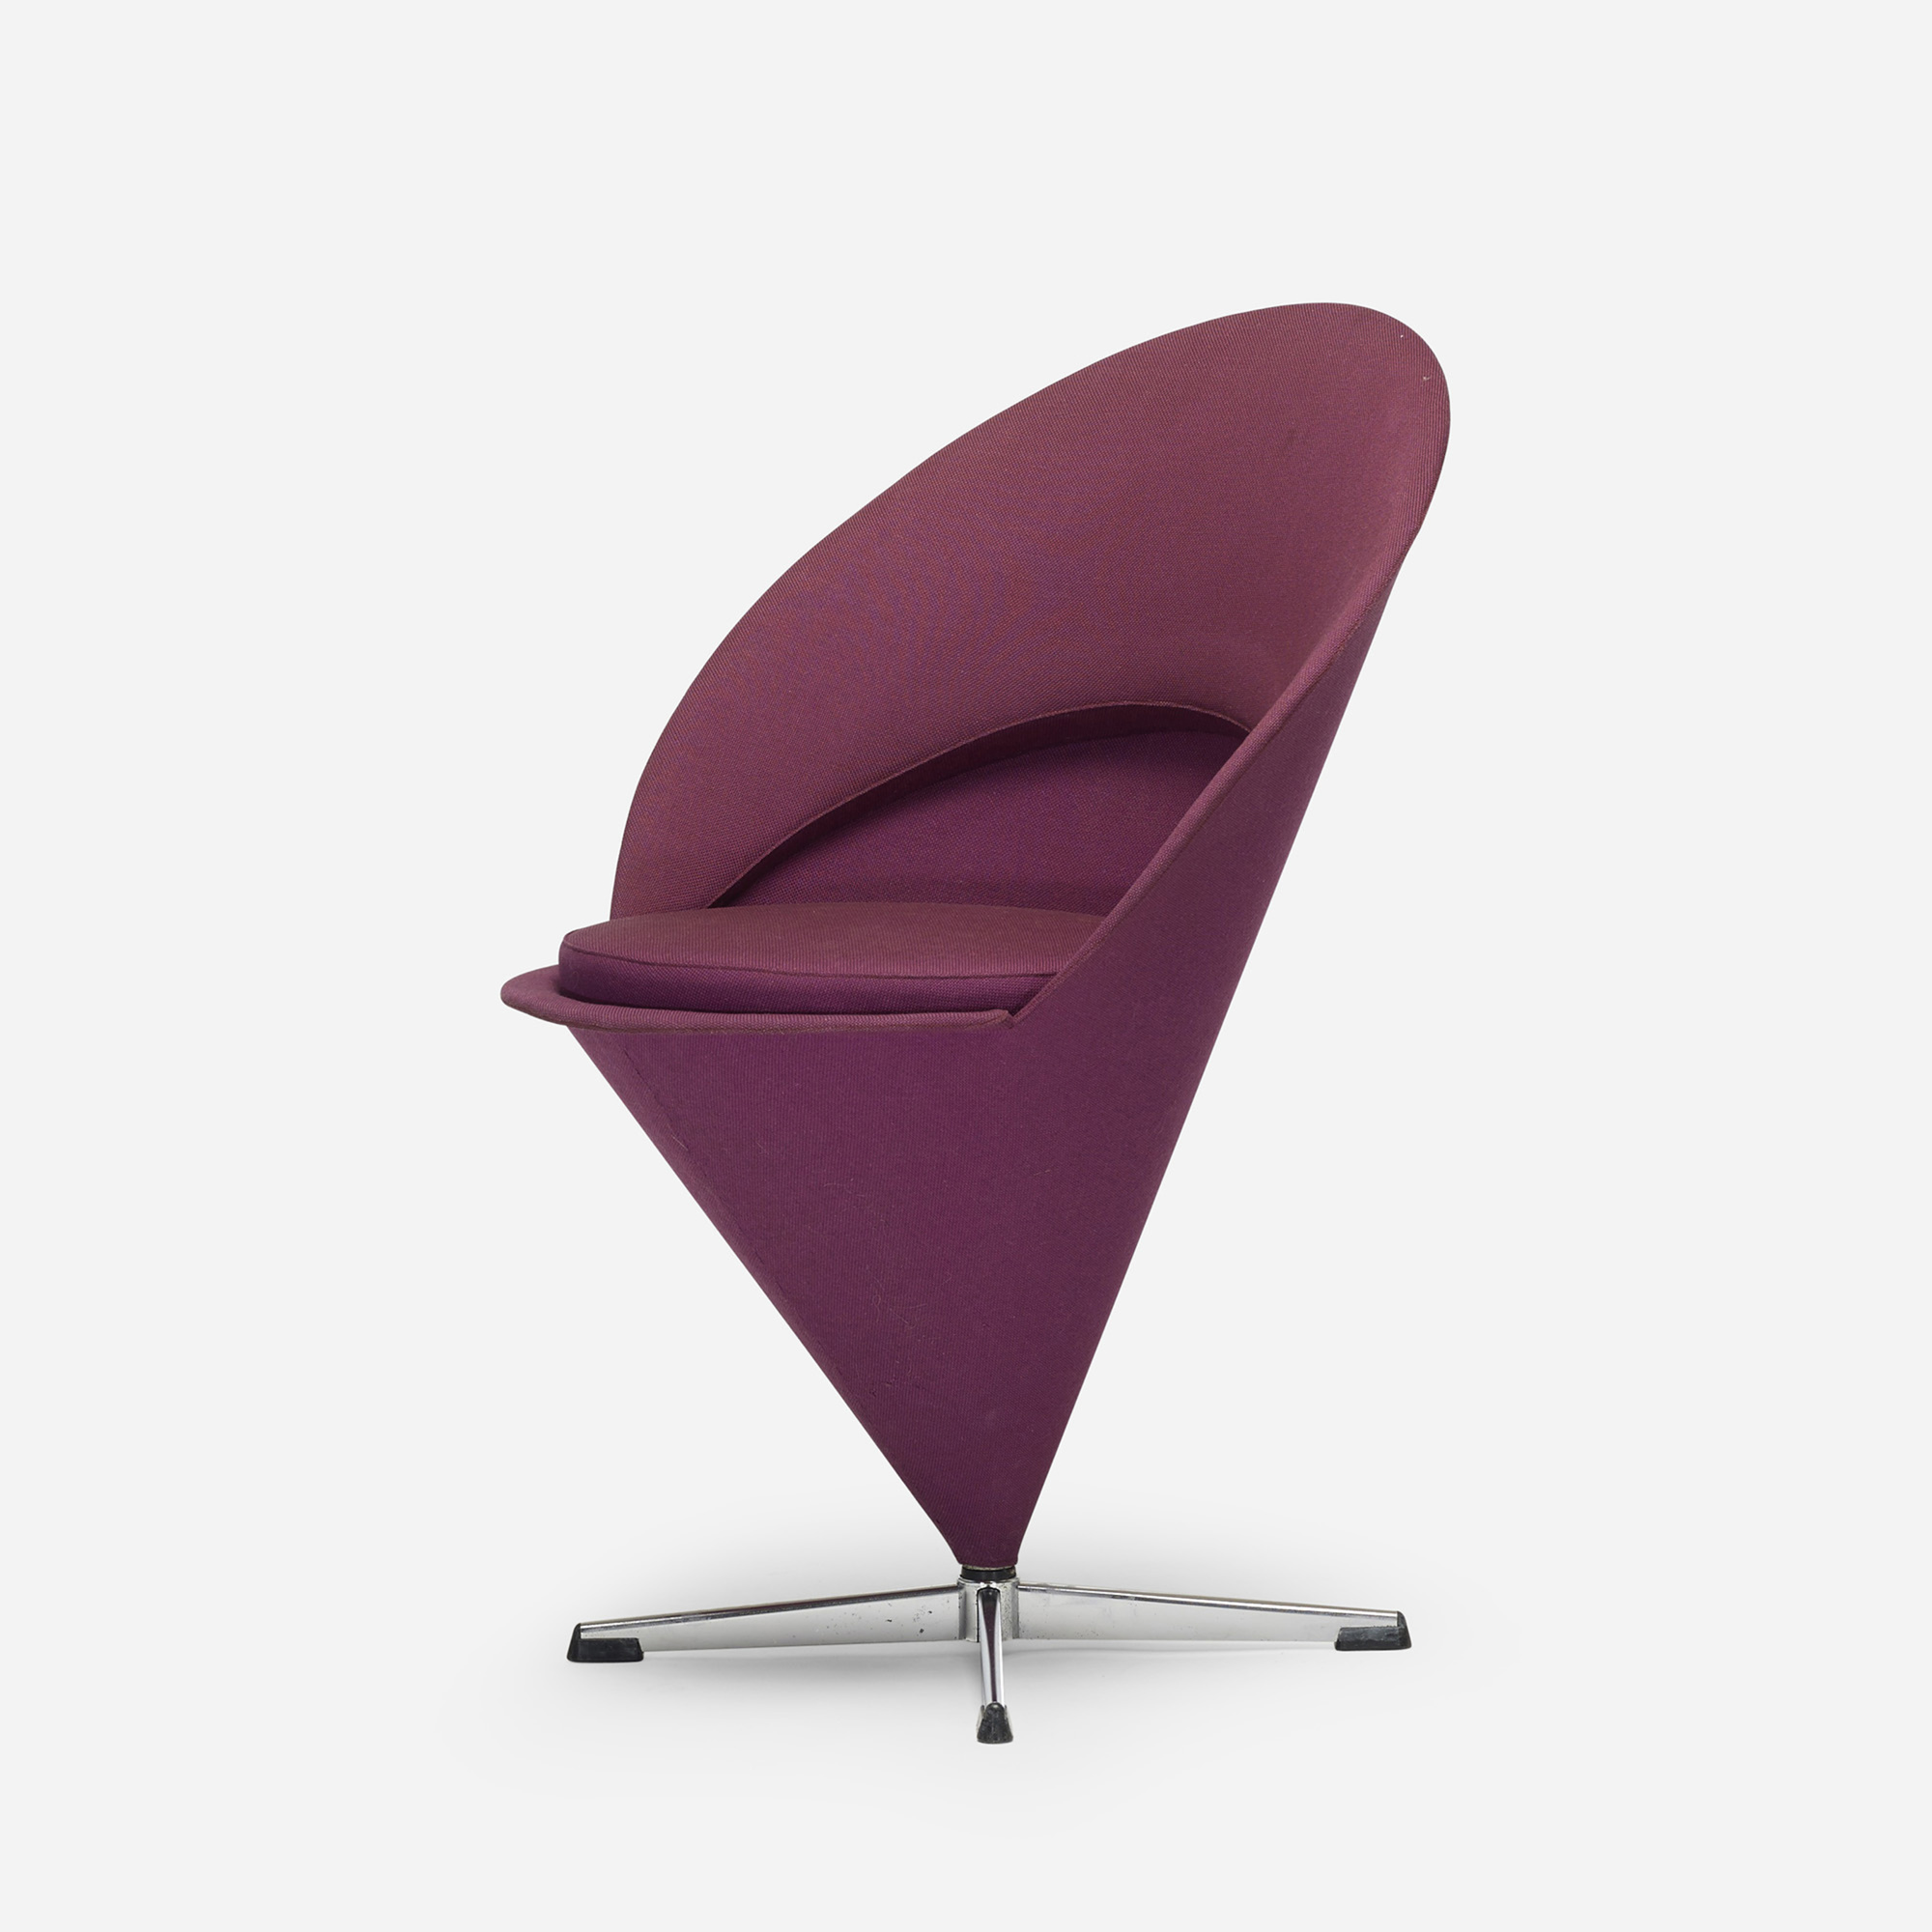 648: Verner Panton / Cone chair (2 of 4)